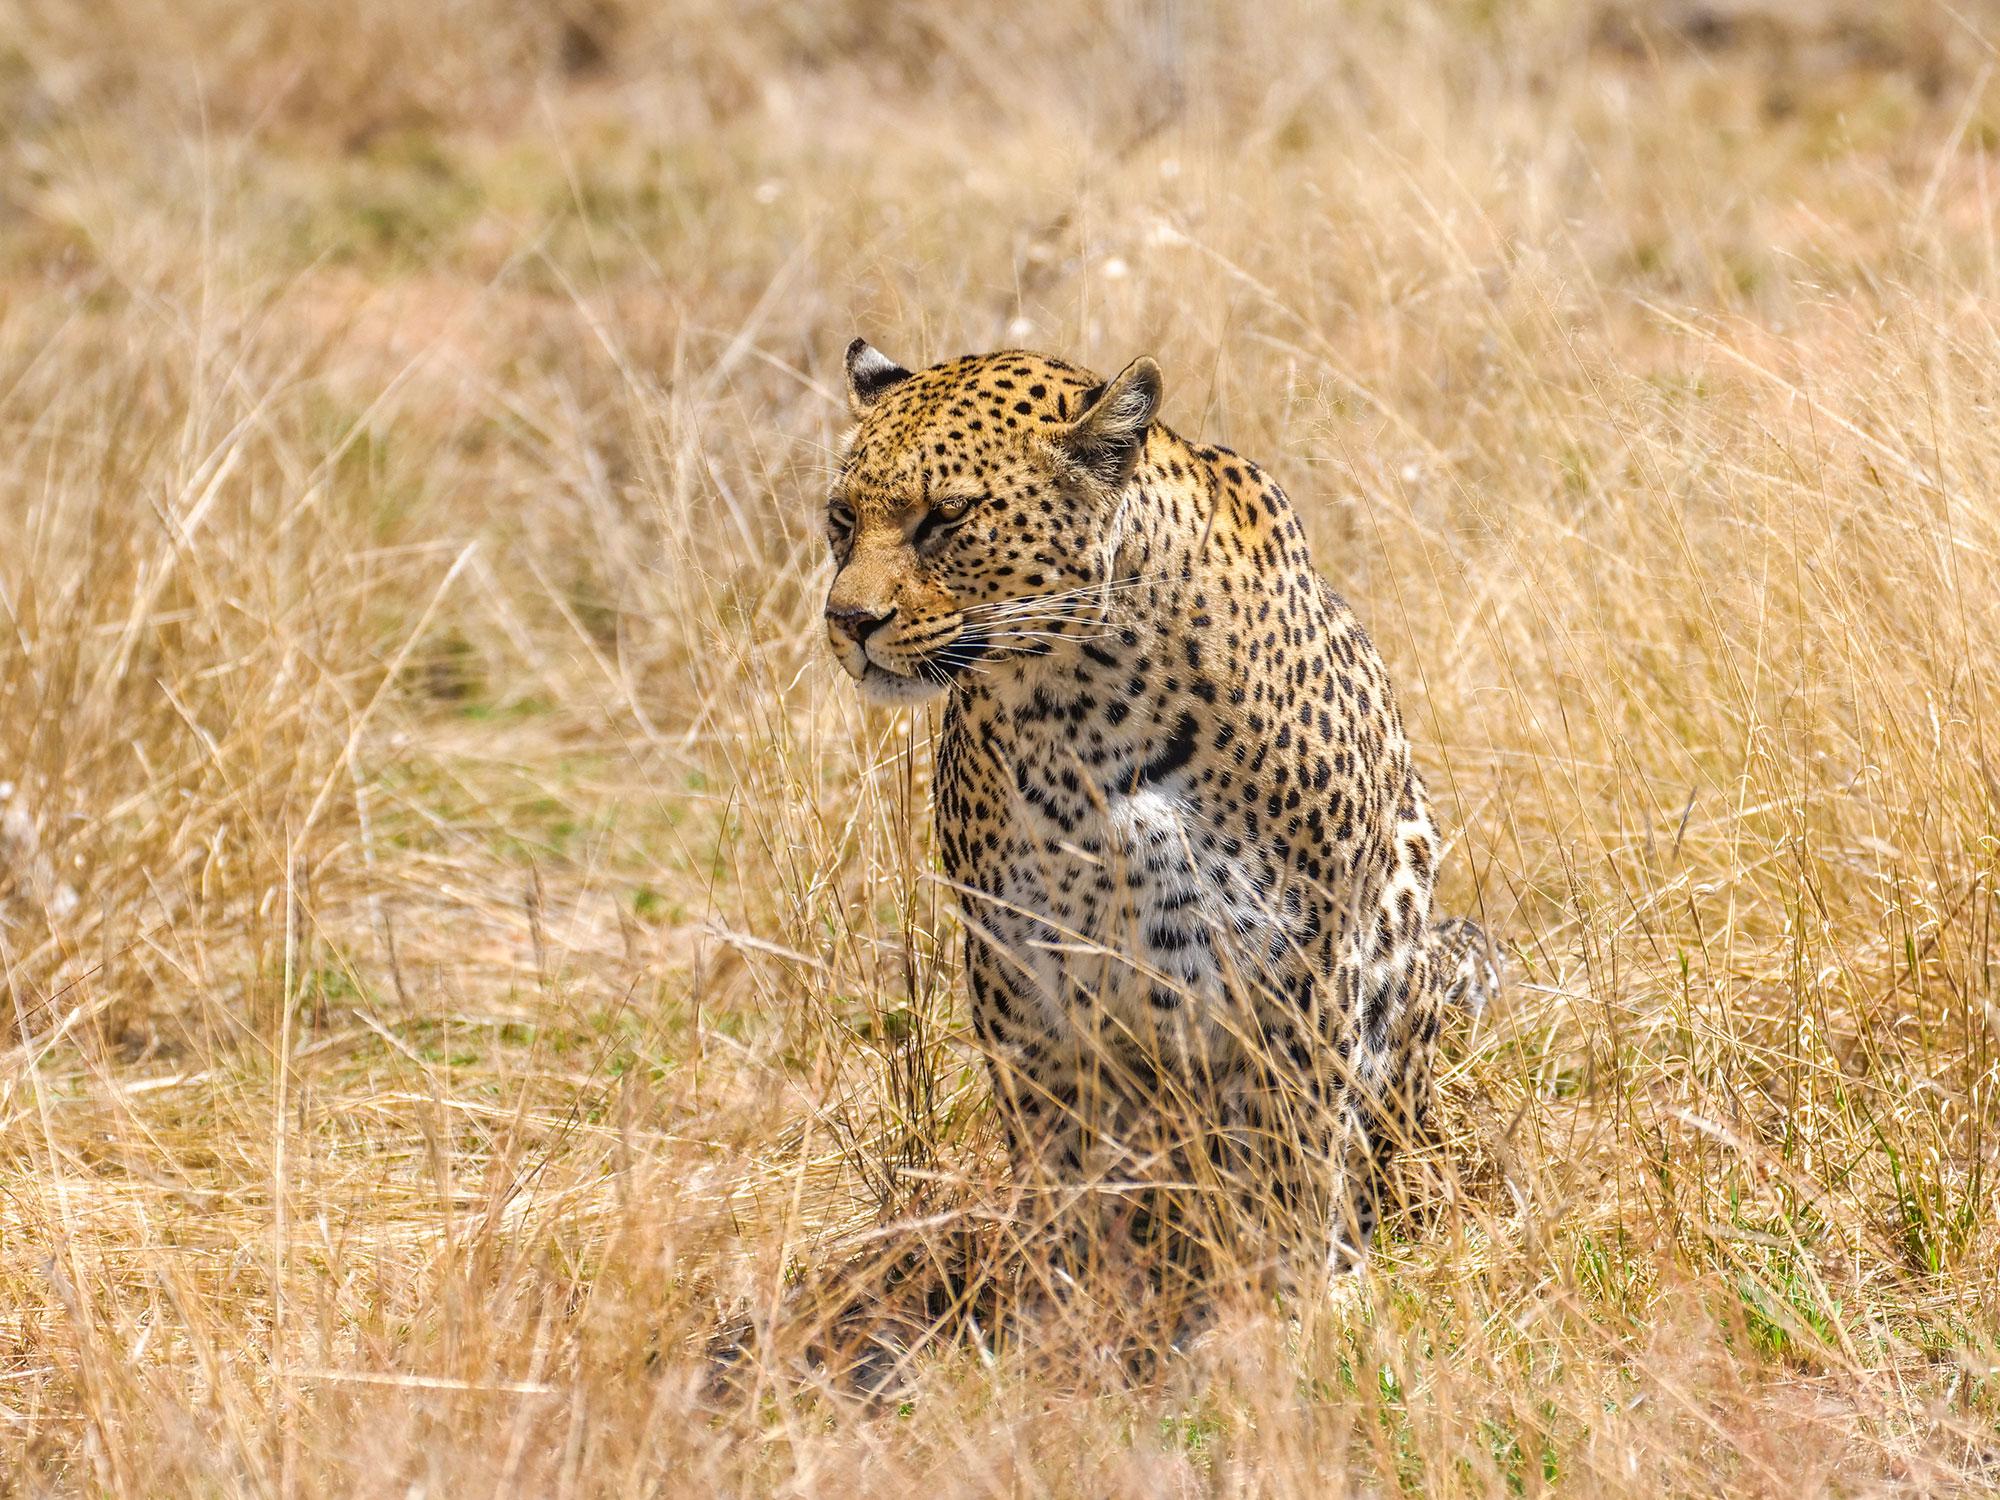 Leopard at N/a'an ku sê (Naankuse) Wildlife Sanctuary in Namibia, Africa